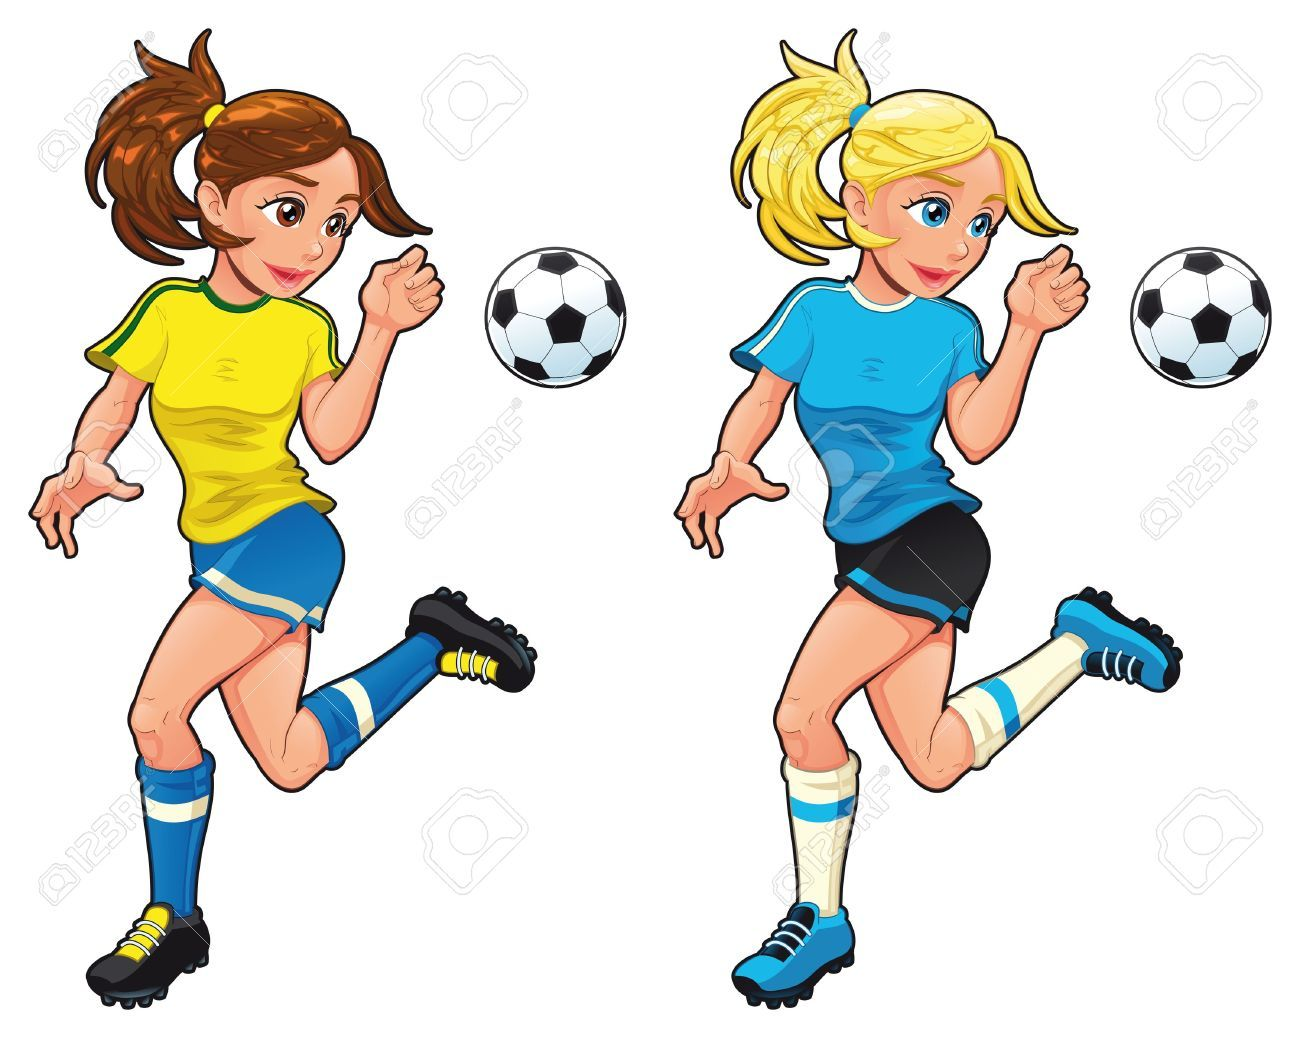 Resultado De Imagen Para Futbol Femenino Dibujos Fútbol Dibujos